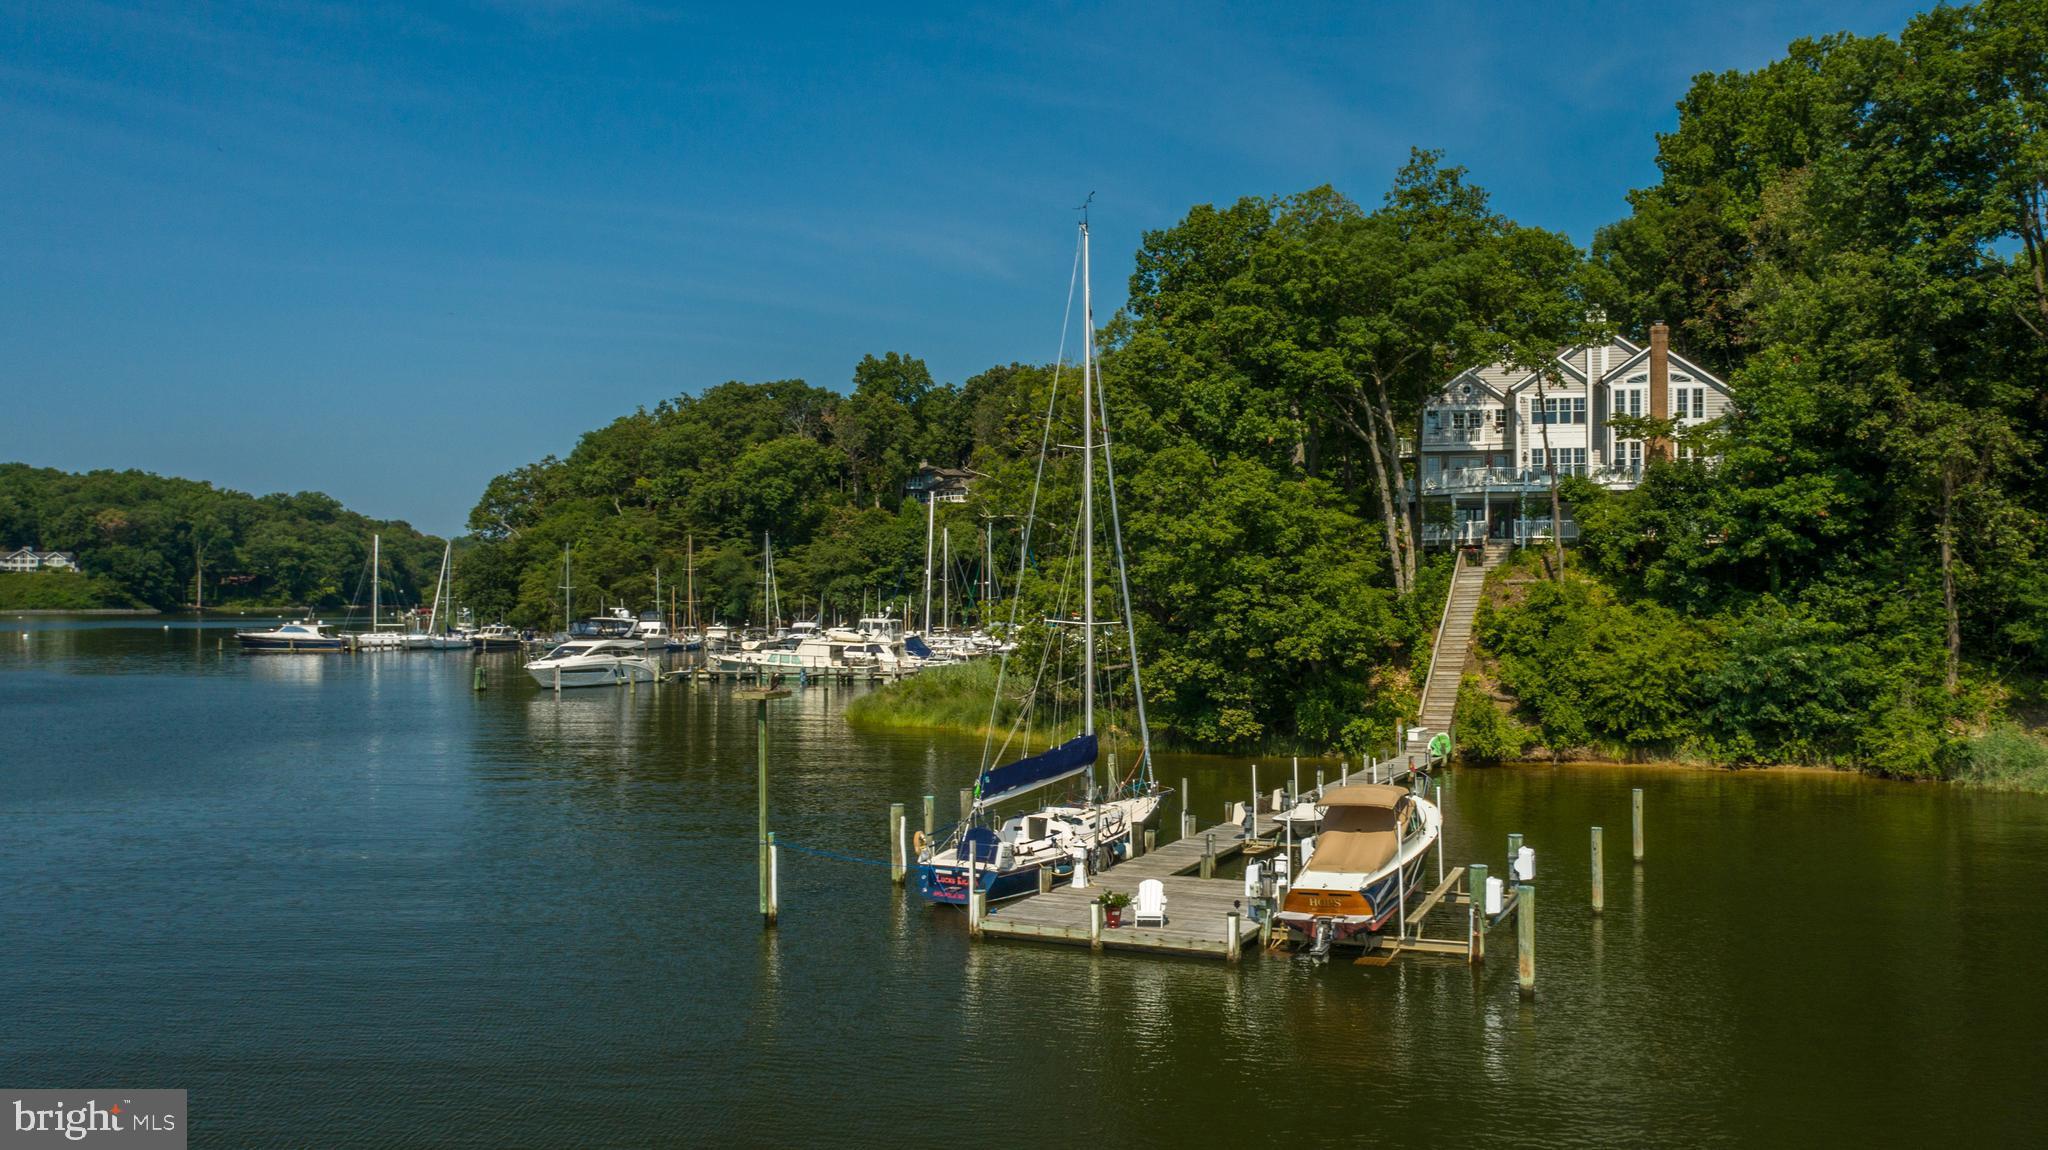 1489 Bridgewater Wy, Annapolis, MD, 21401